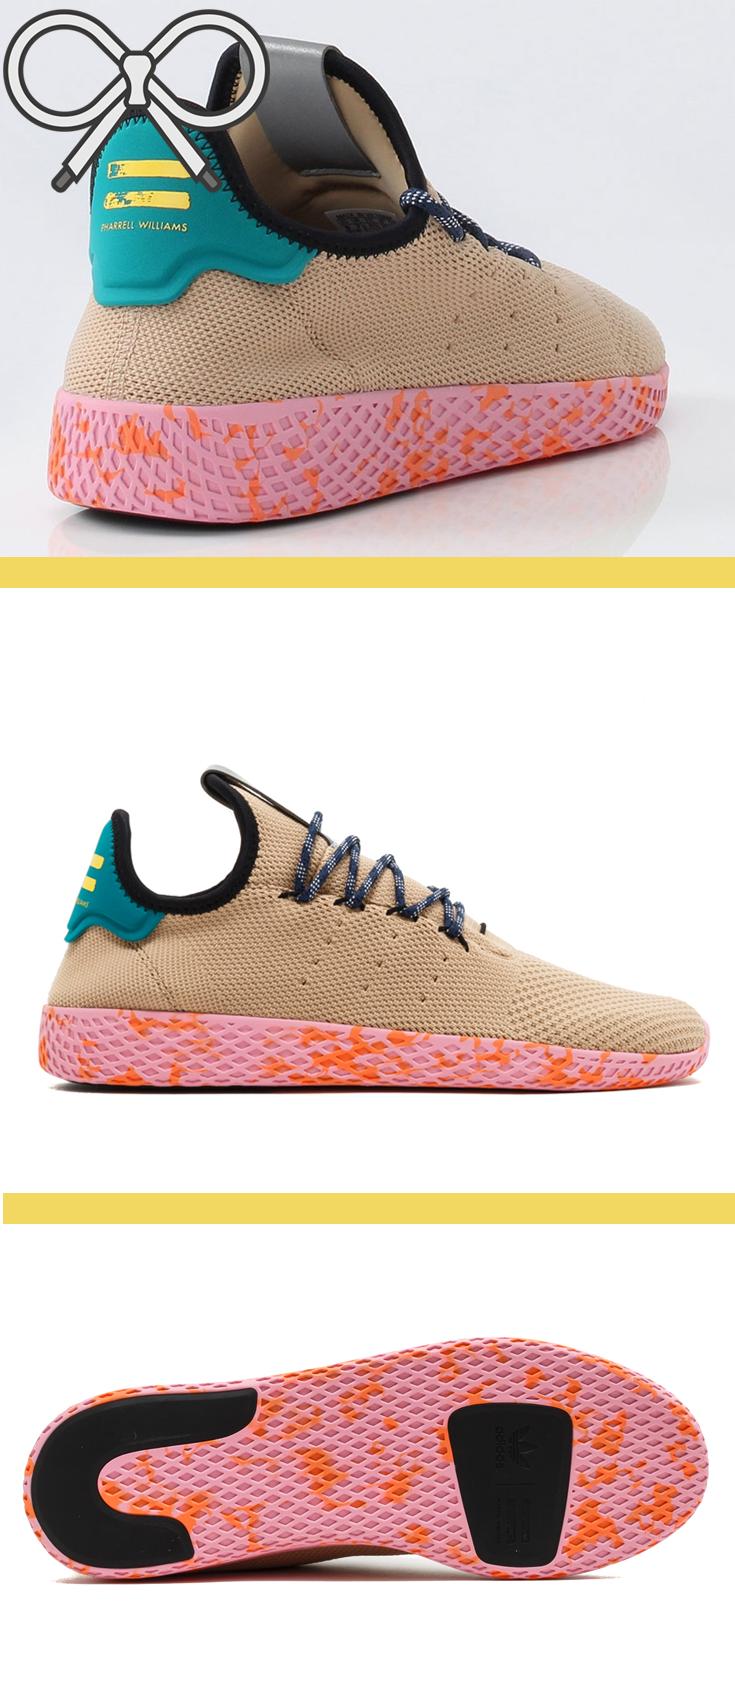 4307c47ea1e28 The slick Pharrell Williams shoes in the tan multi-color variant ...